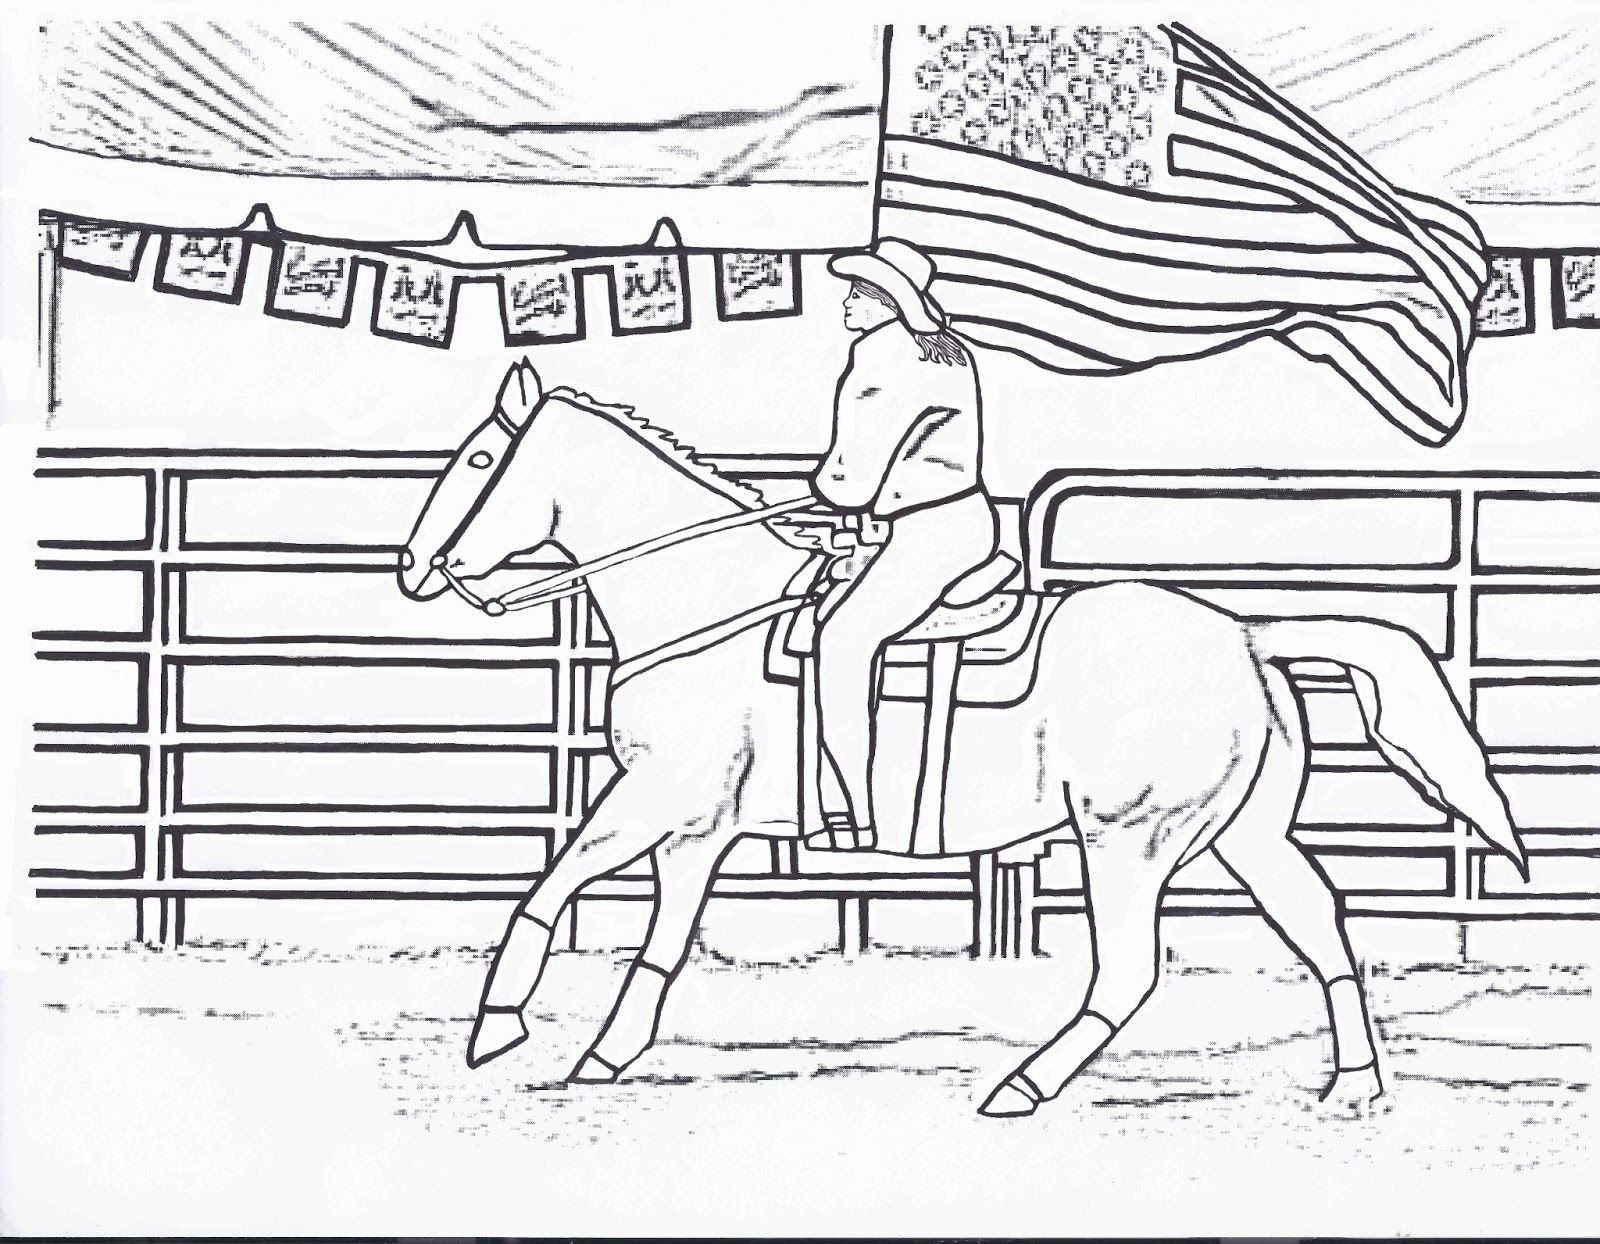 Coloring Rocks Horse Coloring Horse Coloring Pages Horse Coloring Books [ 1244 x 1600 Pixel ]